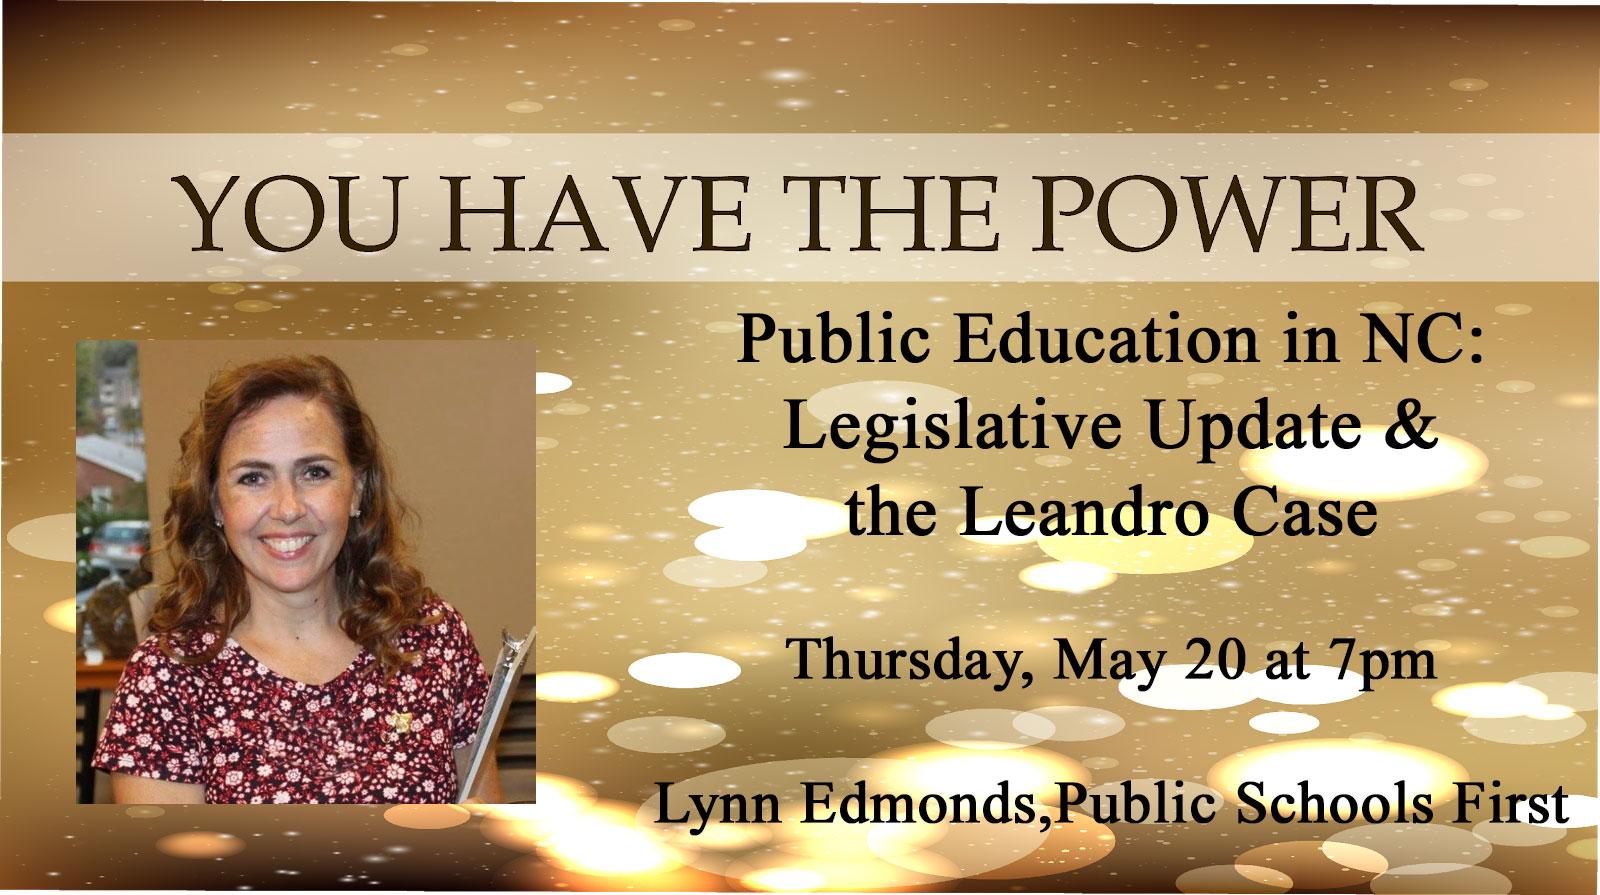 Public Education in NC: Legislative Update & the Leandro Case